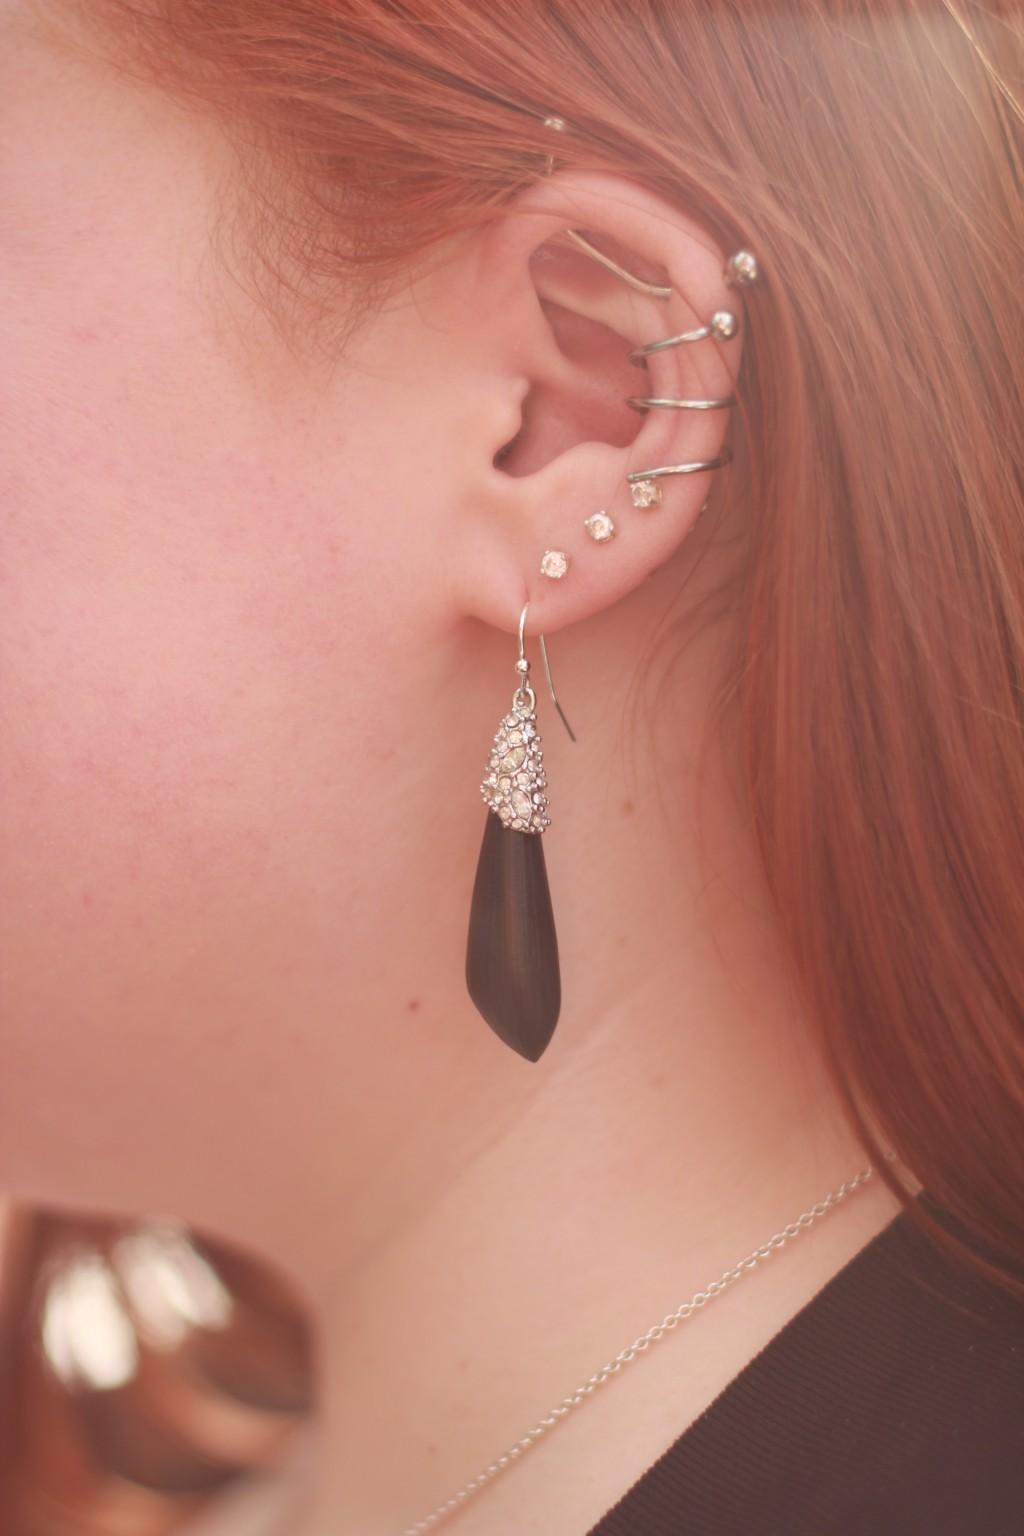 Spiral Ear Piercing